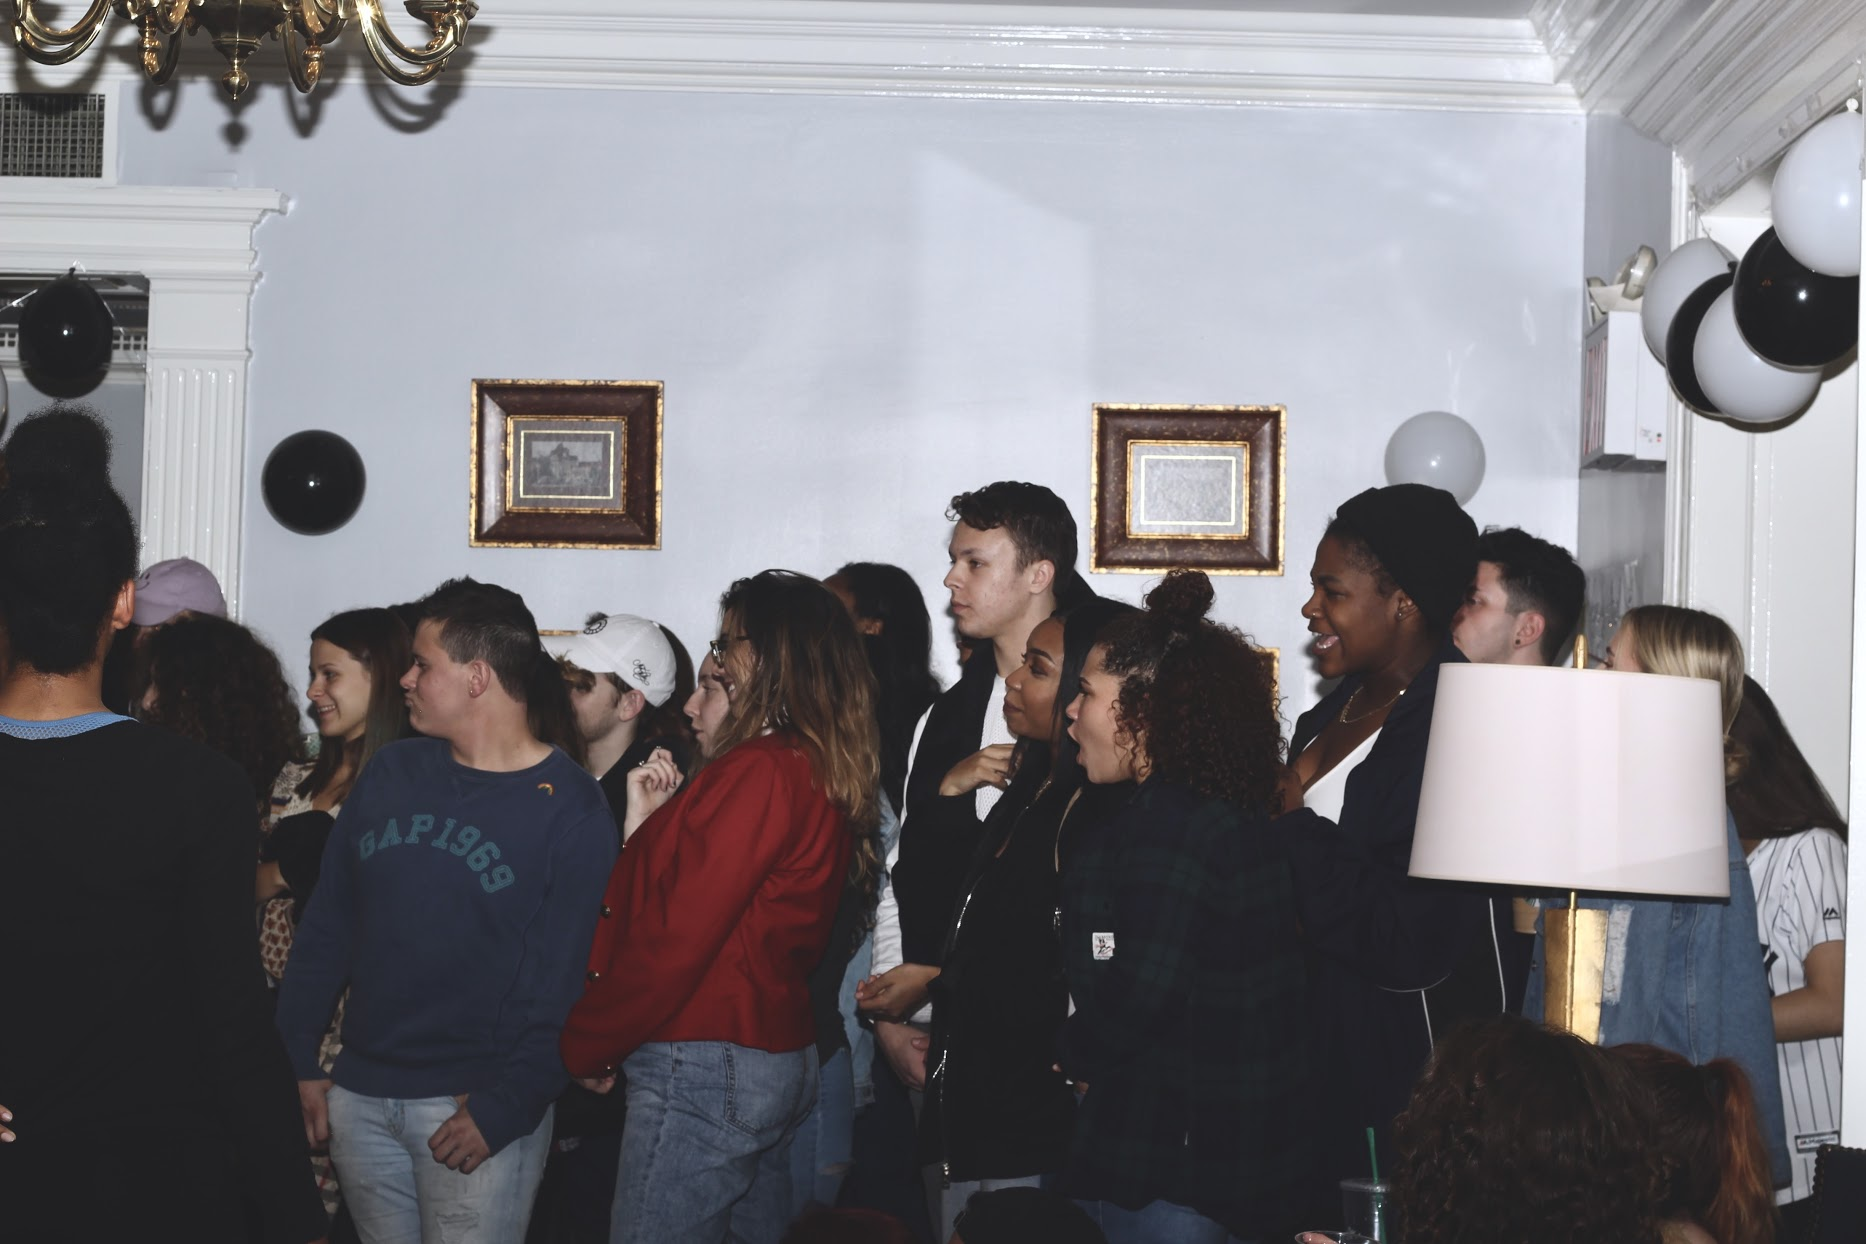 Crowd    Photo taken by Kobi Ross